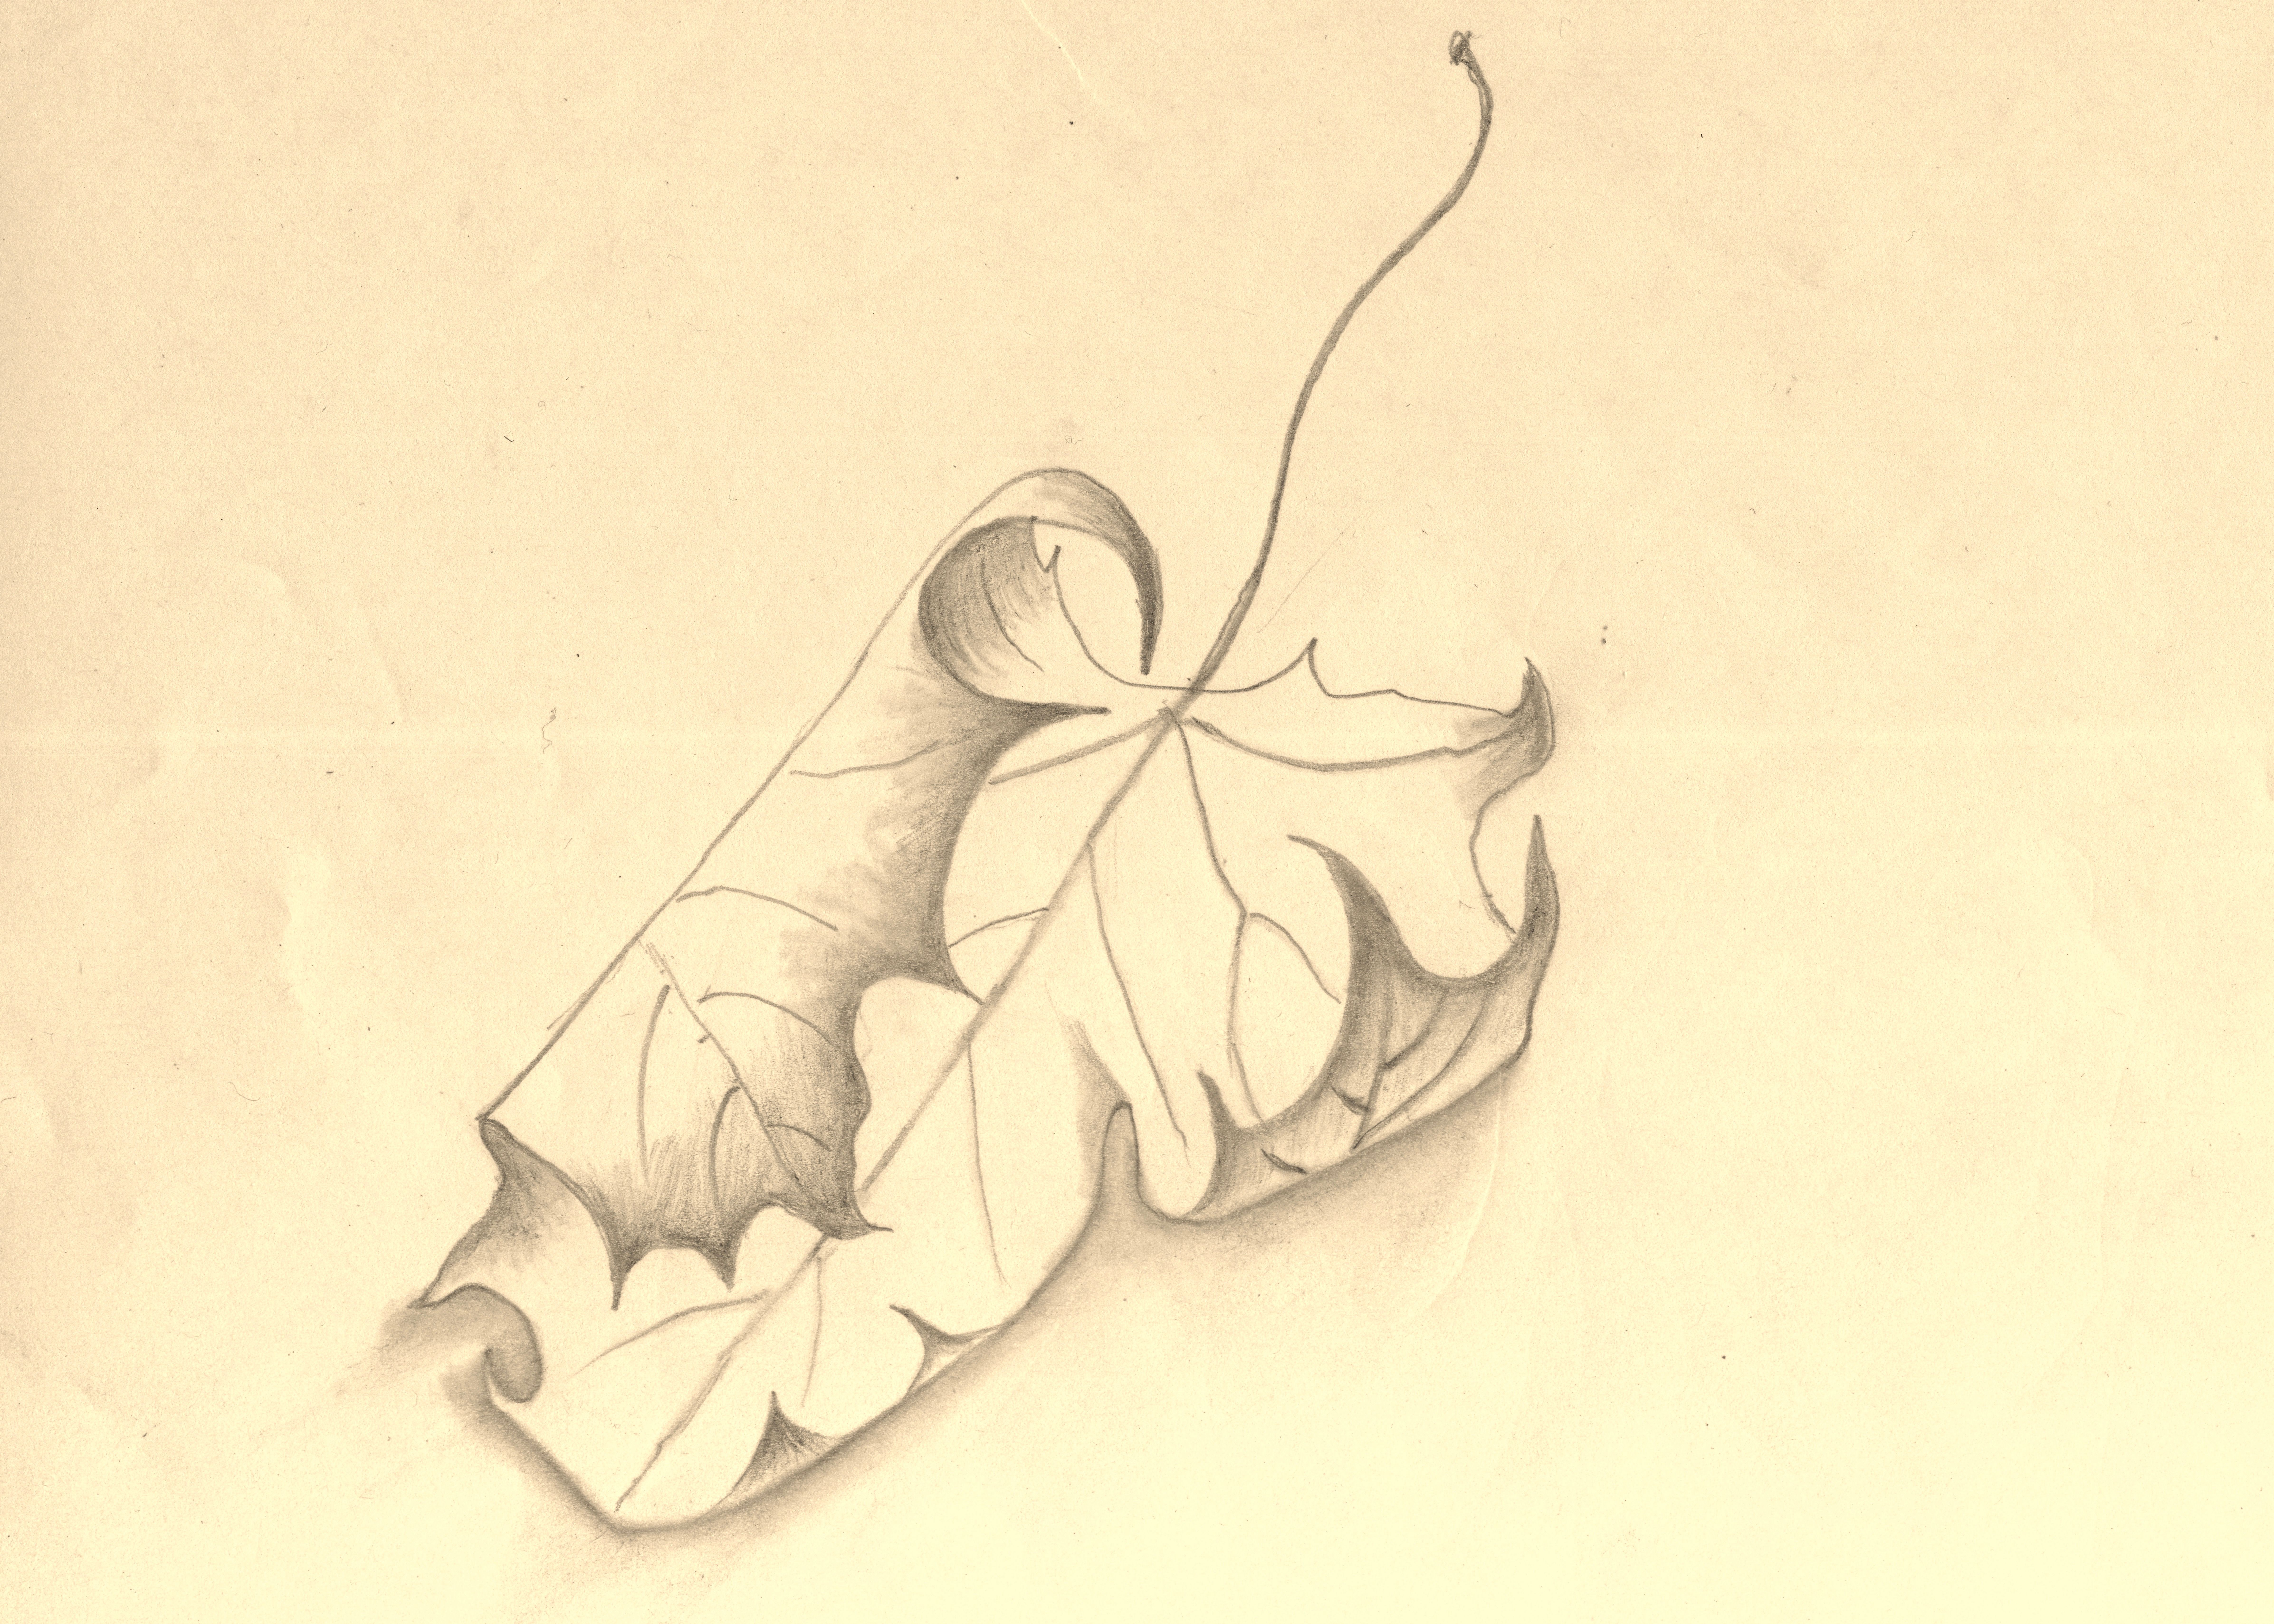 Pin by John on John Art Art, Humanoid sketch